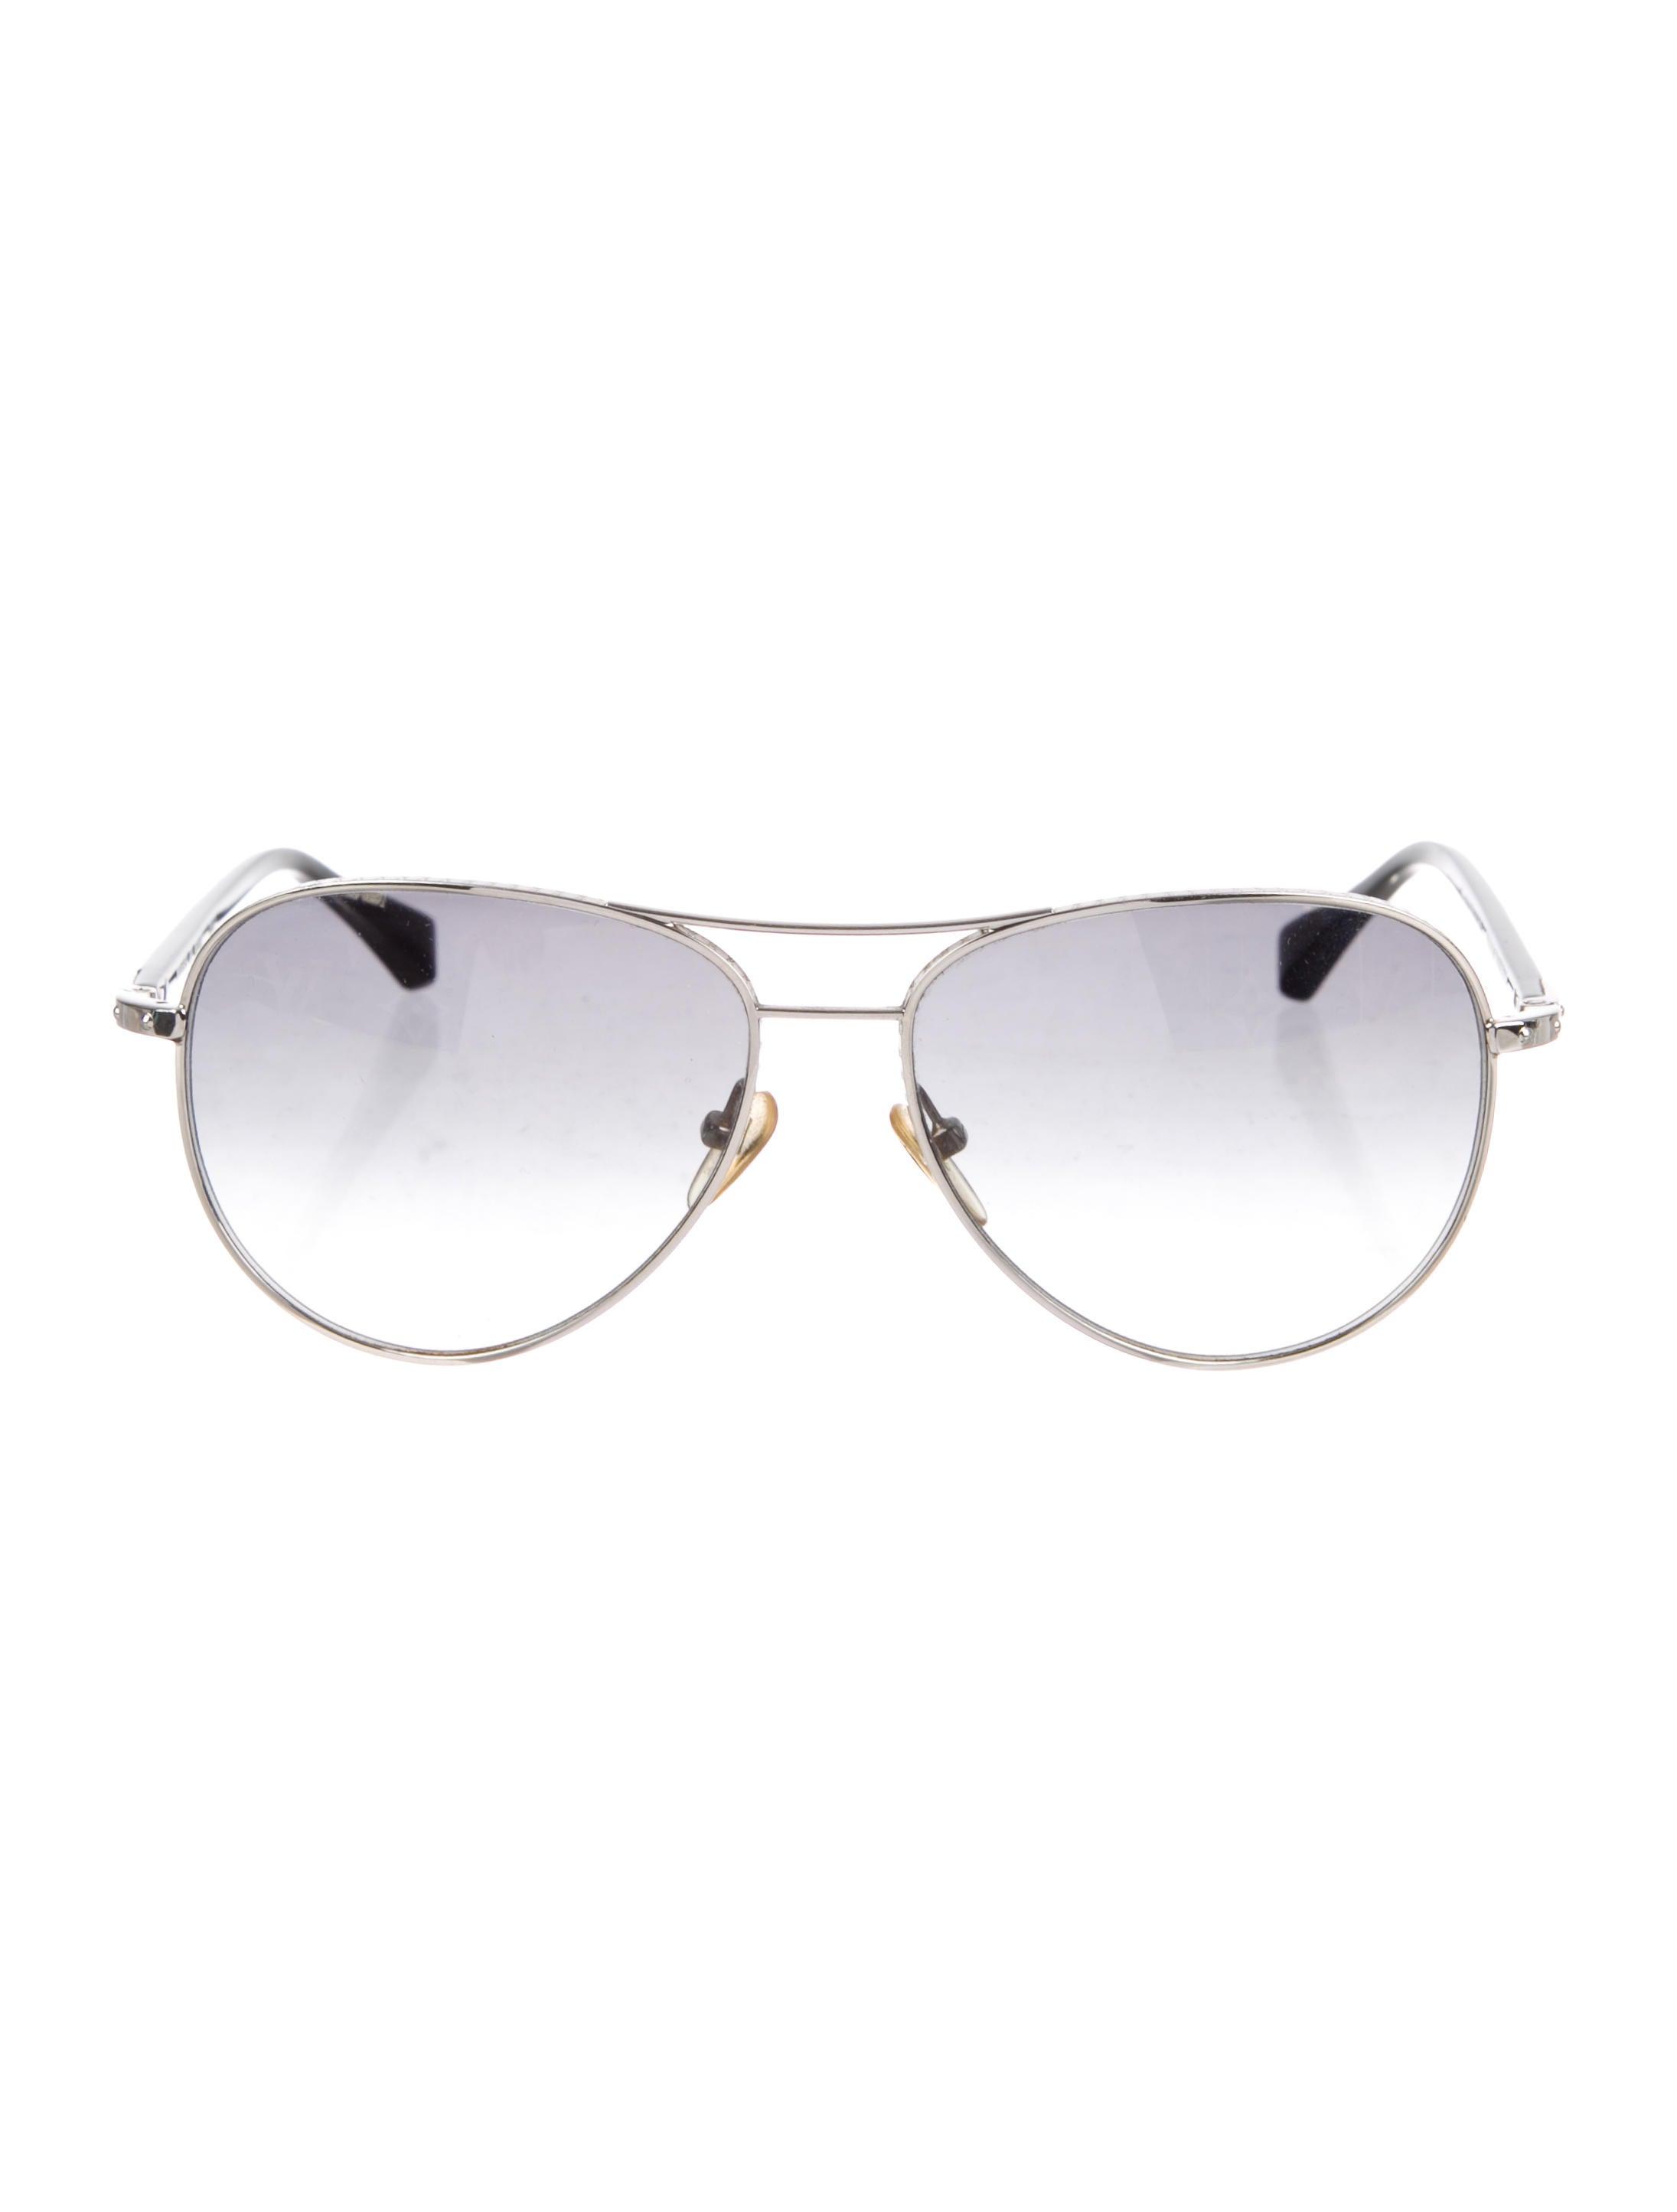 058e9a470b29 Louis Vuitton Conspiration Pilote Sunglasses - Accessories - LOU150569